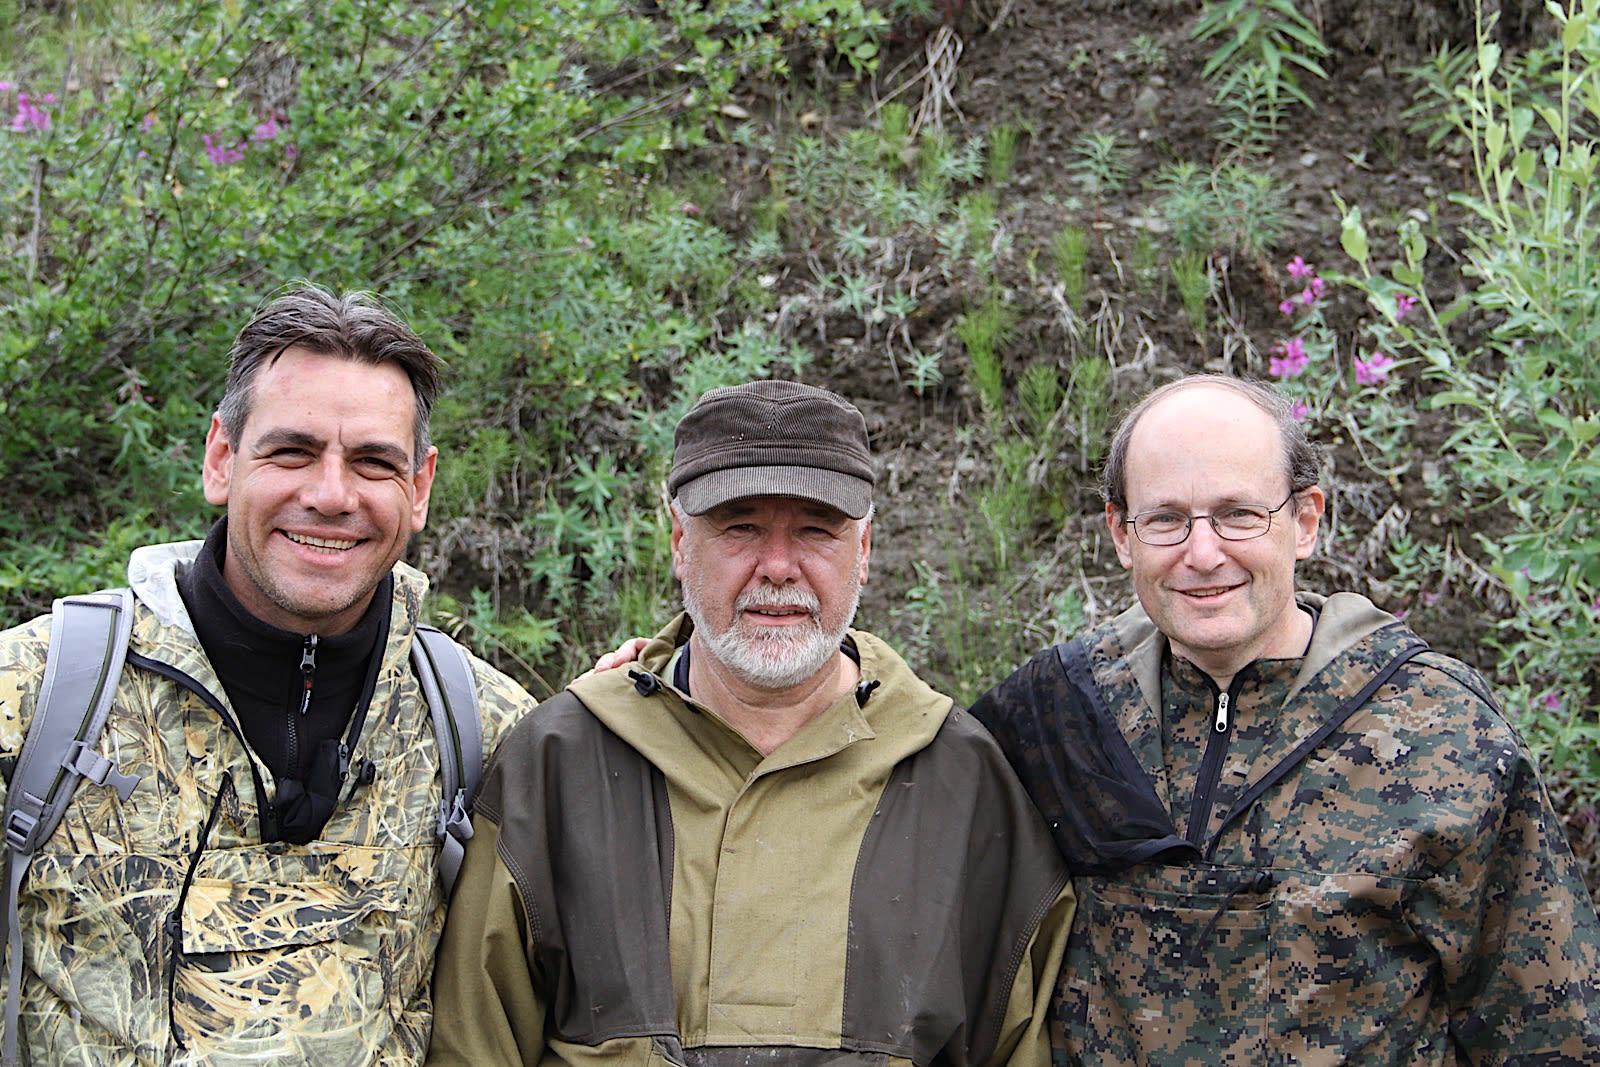 Luca Bindi, Valery Kryachko and Paul Steinhardt (left to right)